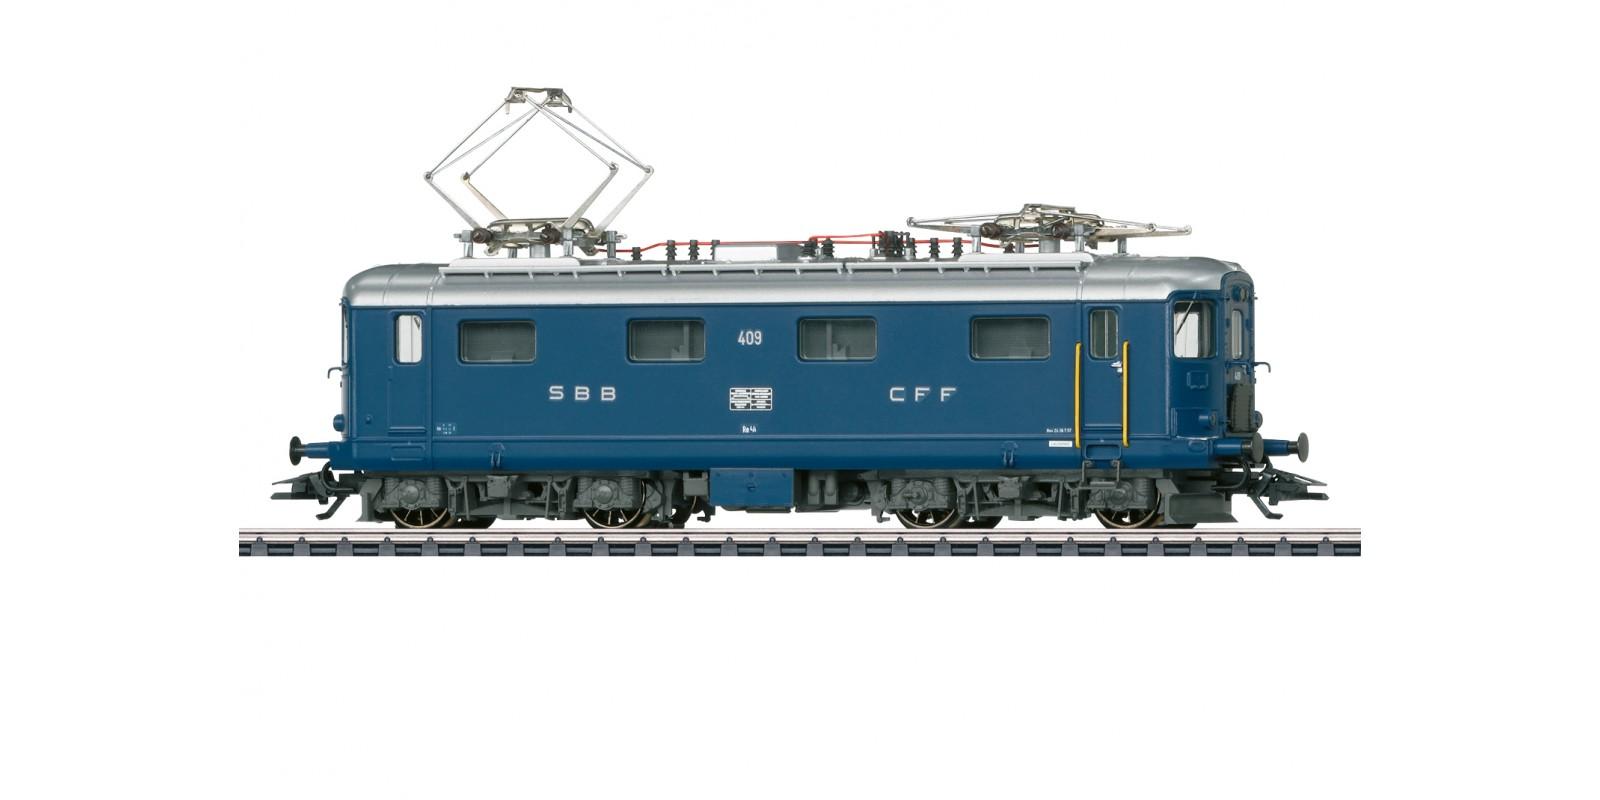 39422 Class Re 4/4 I Electric Locomotive